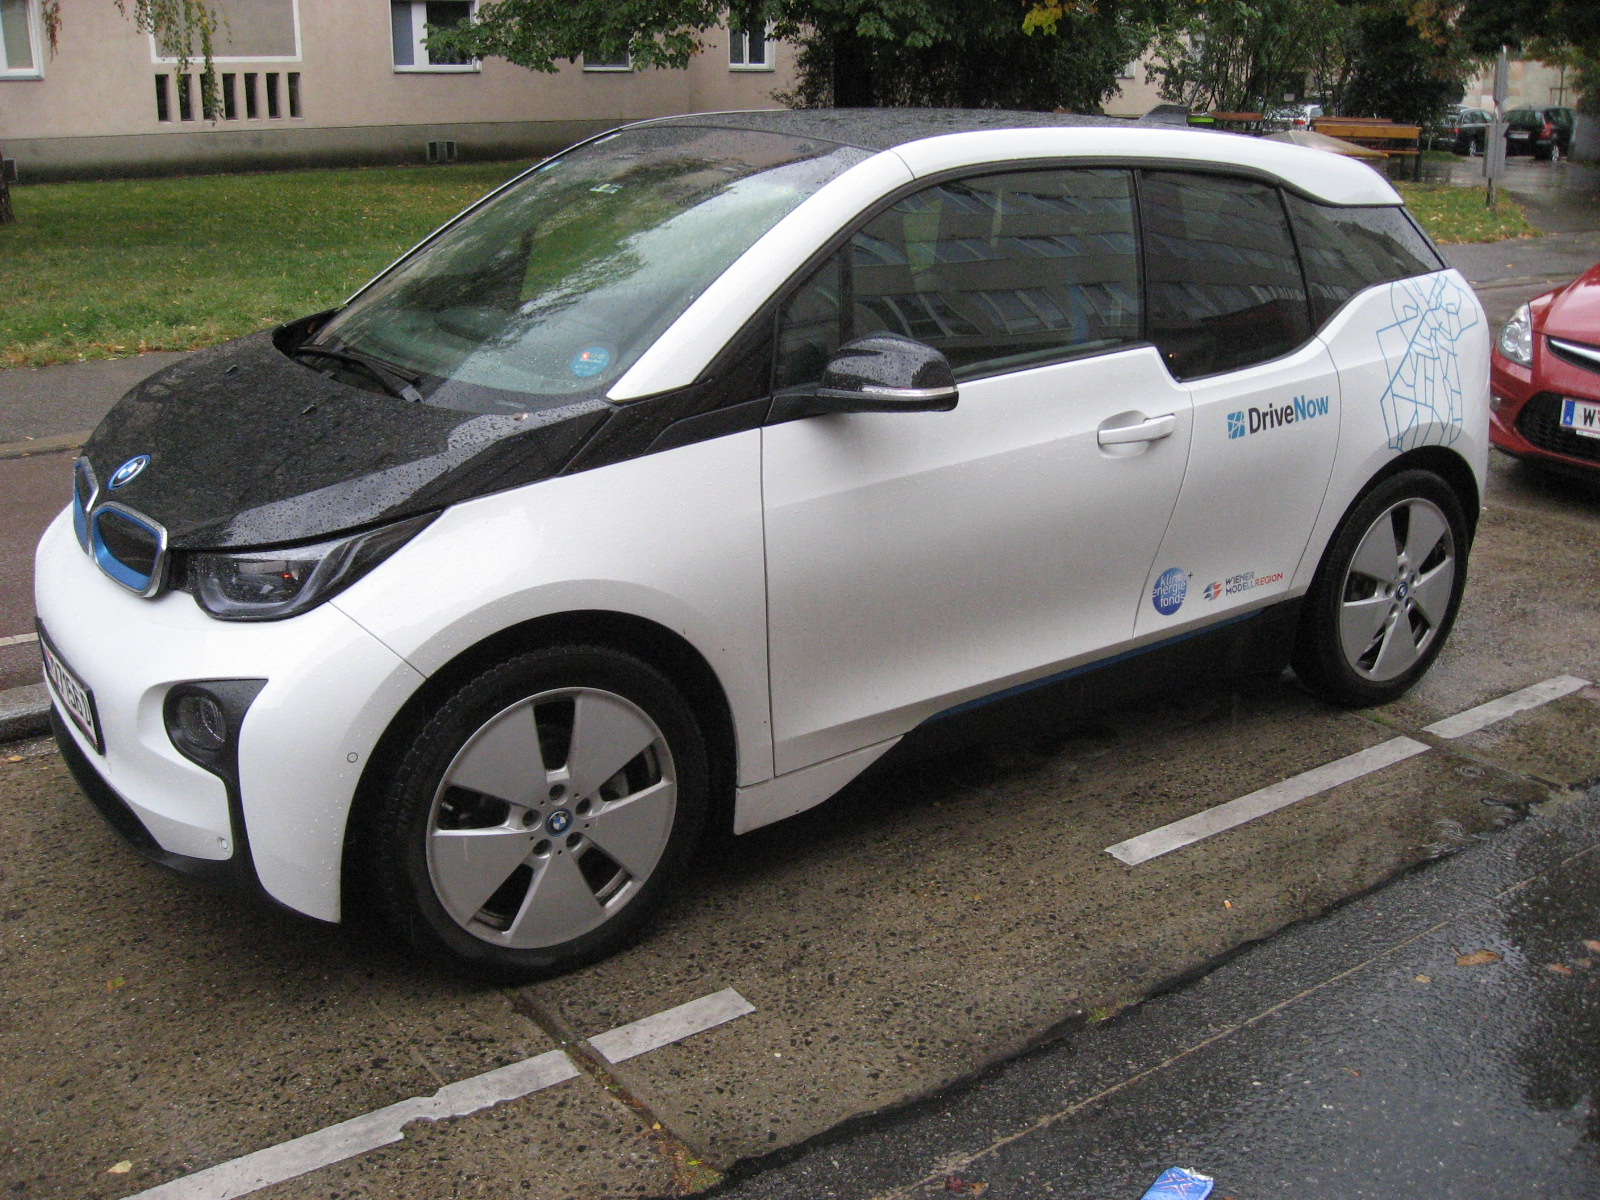 E-Auto in Wien im Mobilitäts-Vergleich | E-Mobilität in Wien